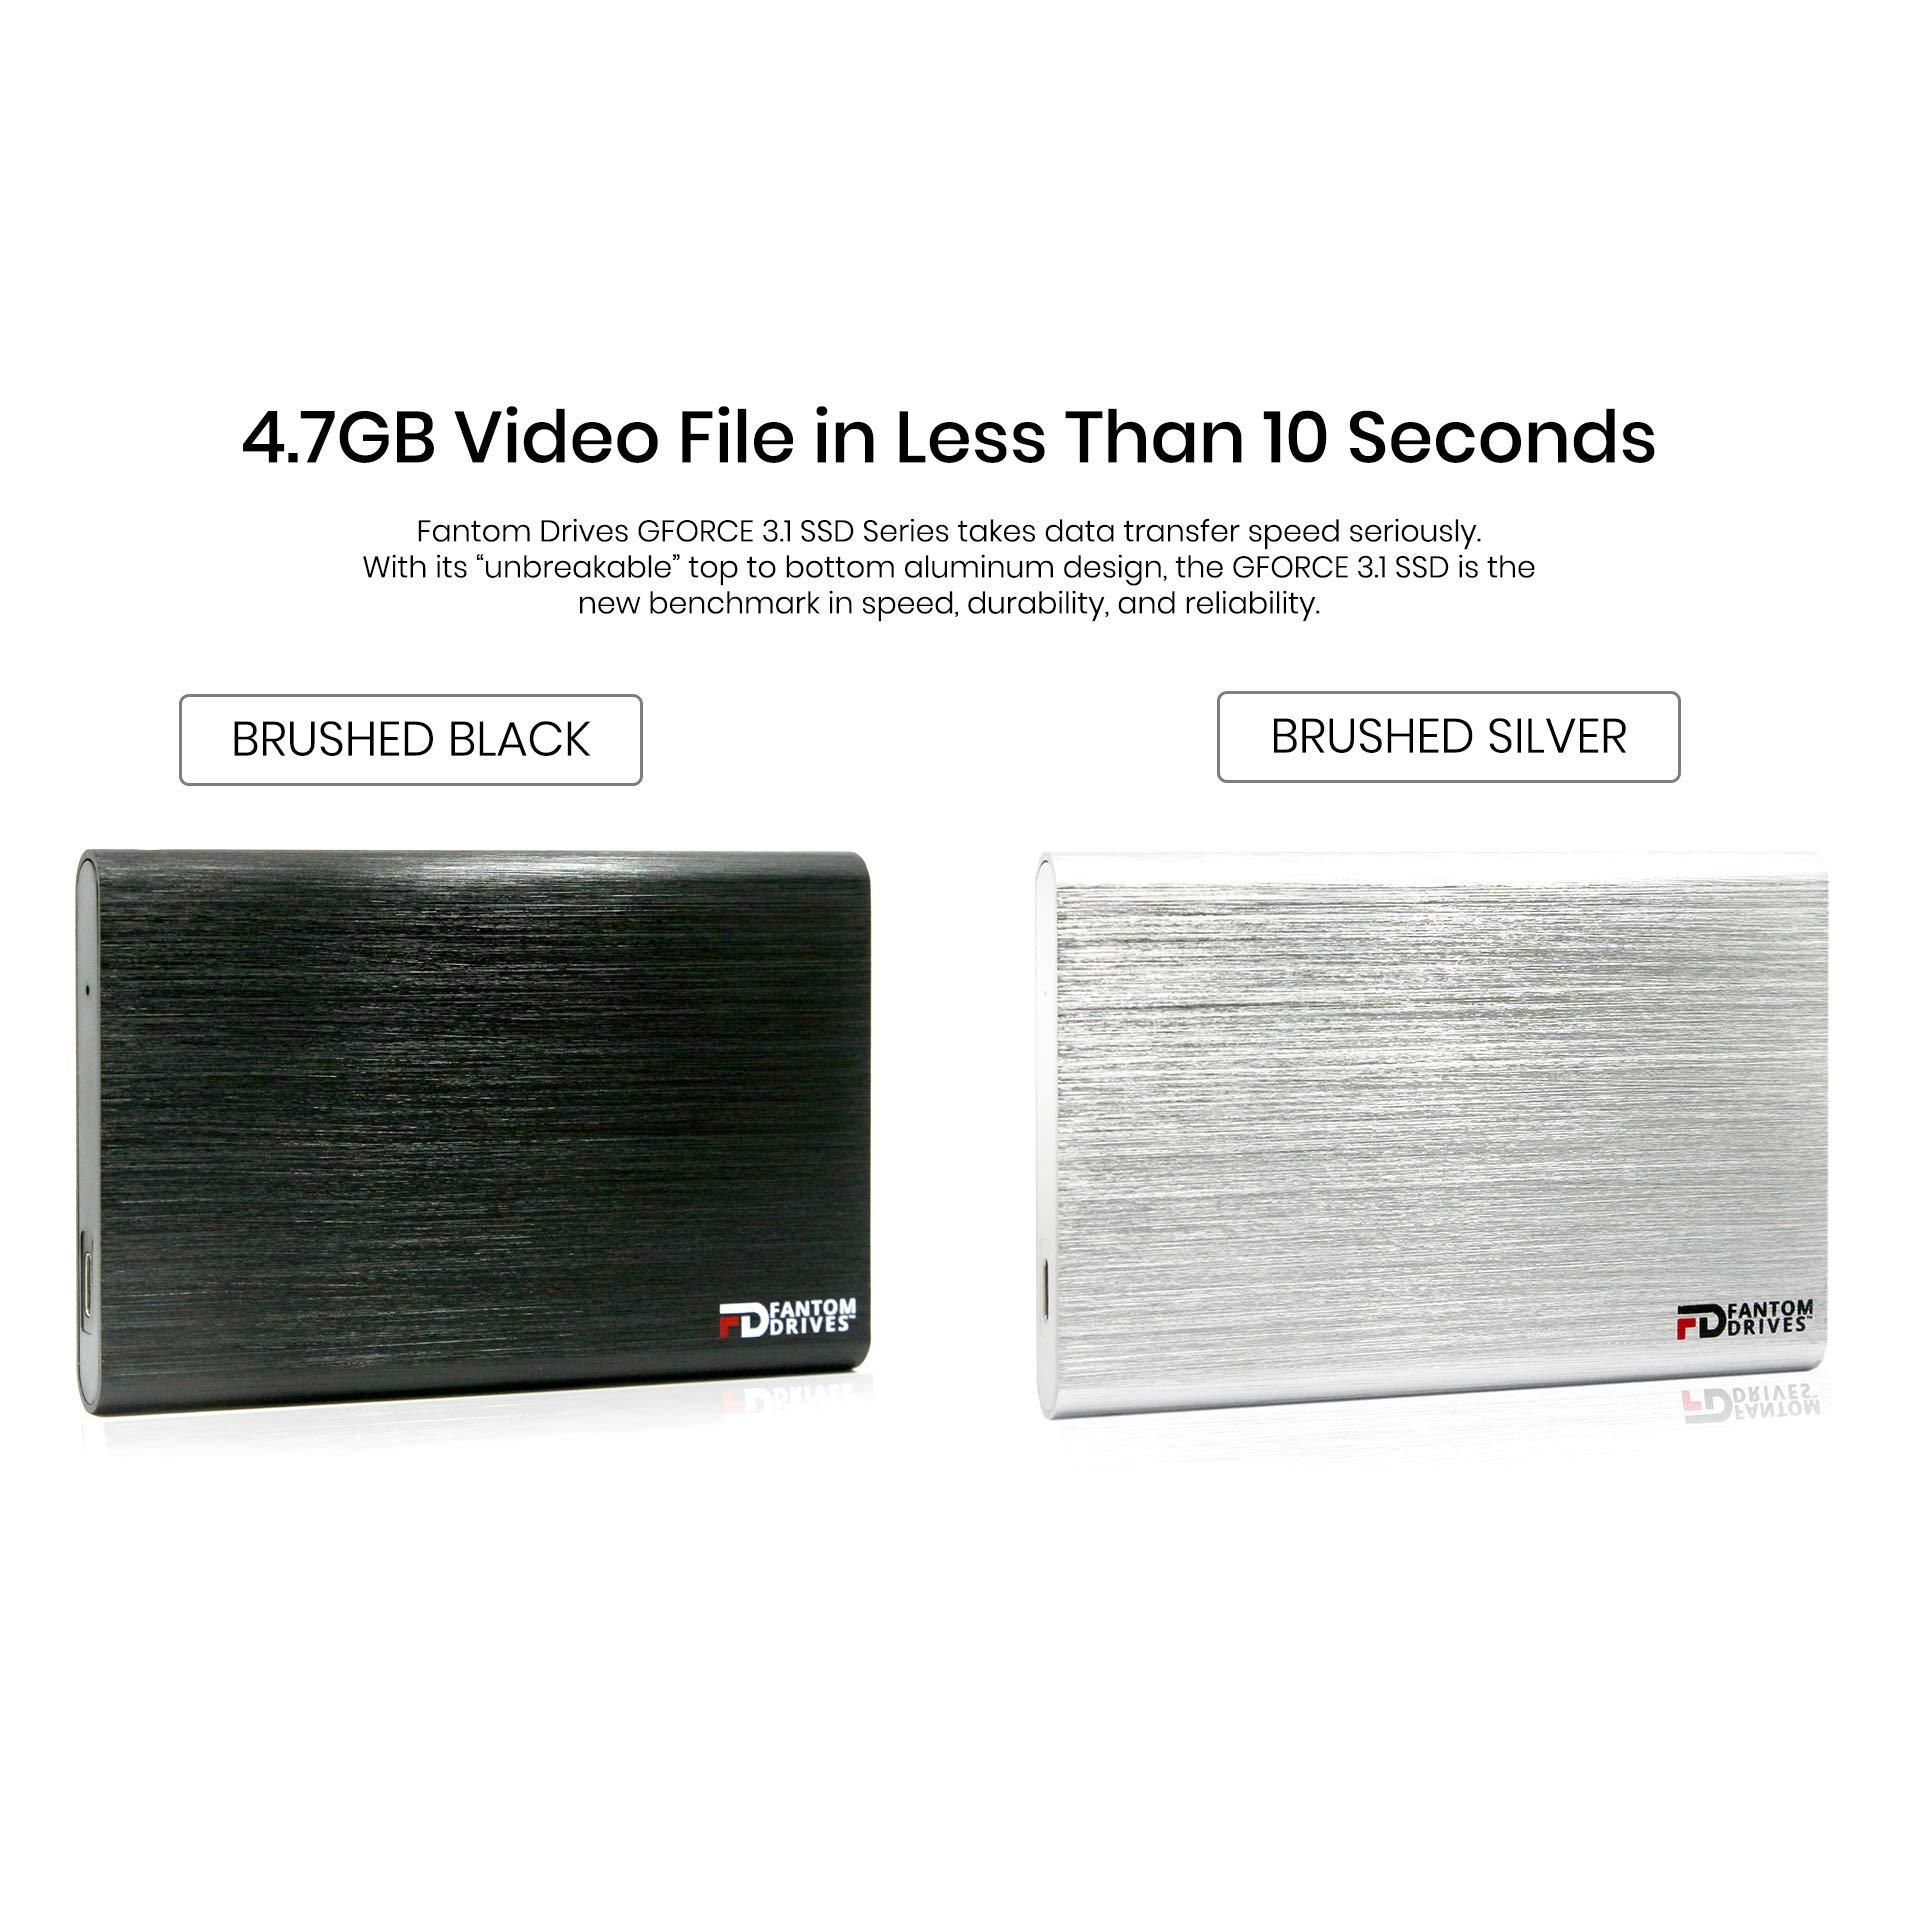 Fantom Drives External SSD 2TB USB 3.1 Gen 2 Type-C 10Gb/s - Silver - Windows - GFORCE 3.1 Portable SSD Series by Fantom Drives (Image #7)